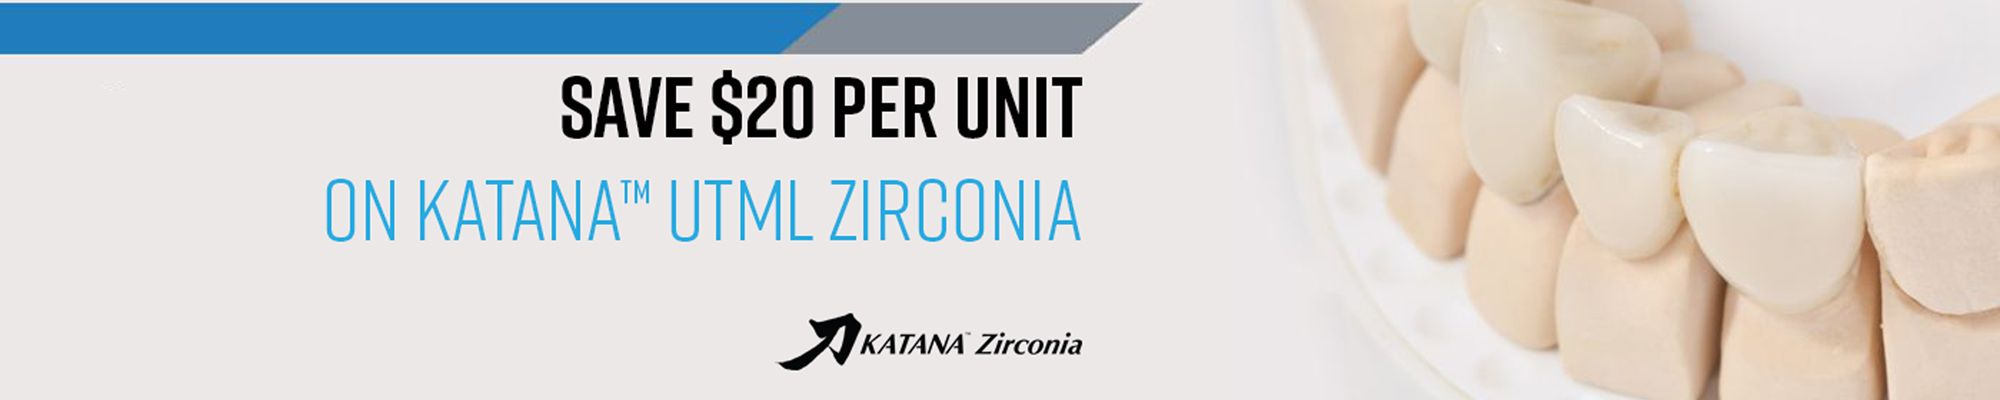 Katana zirconia first choice dental lab®